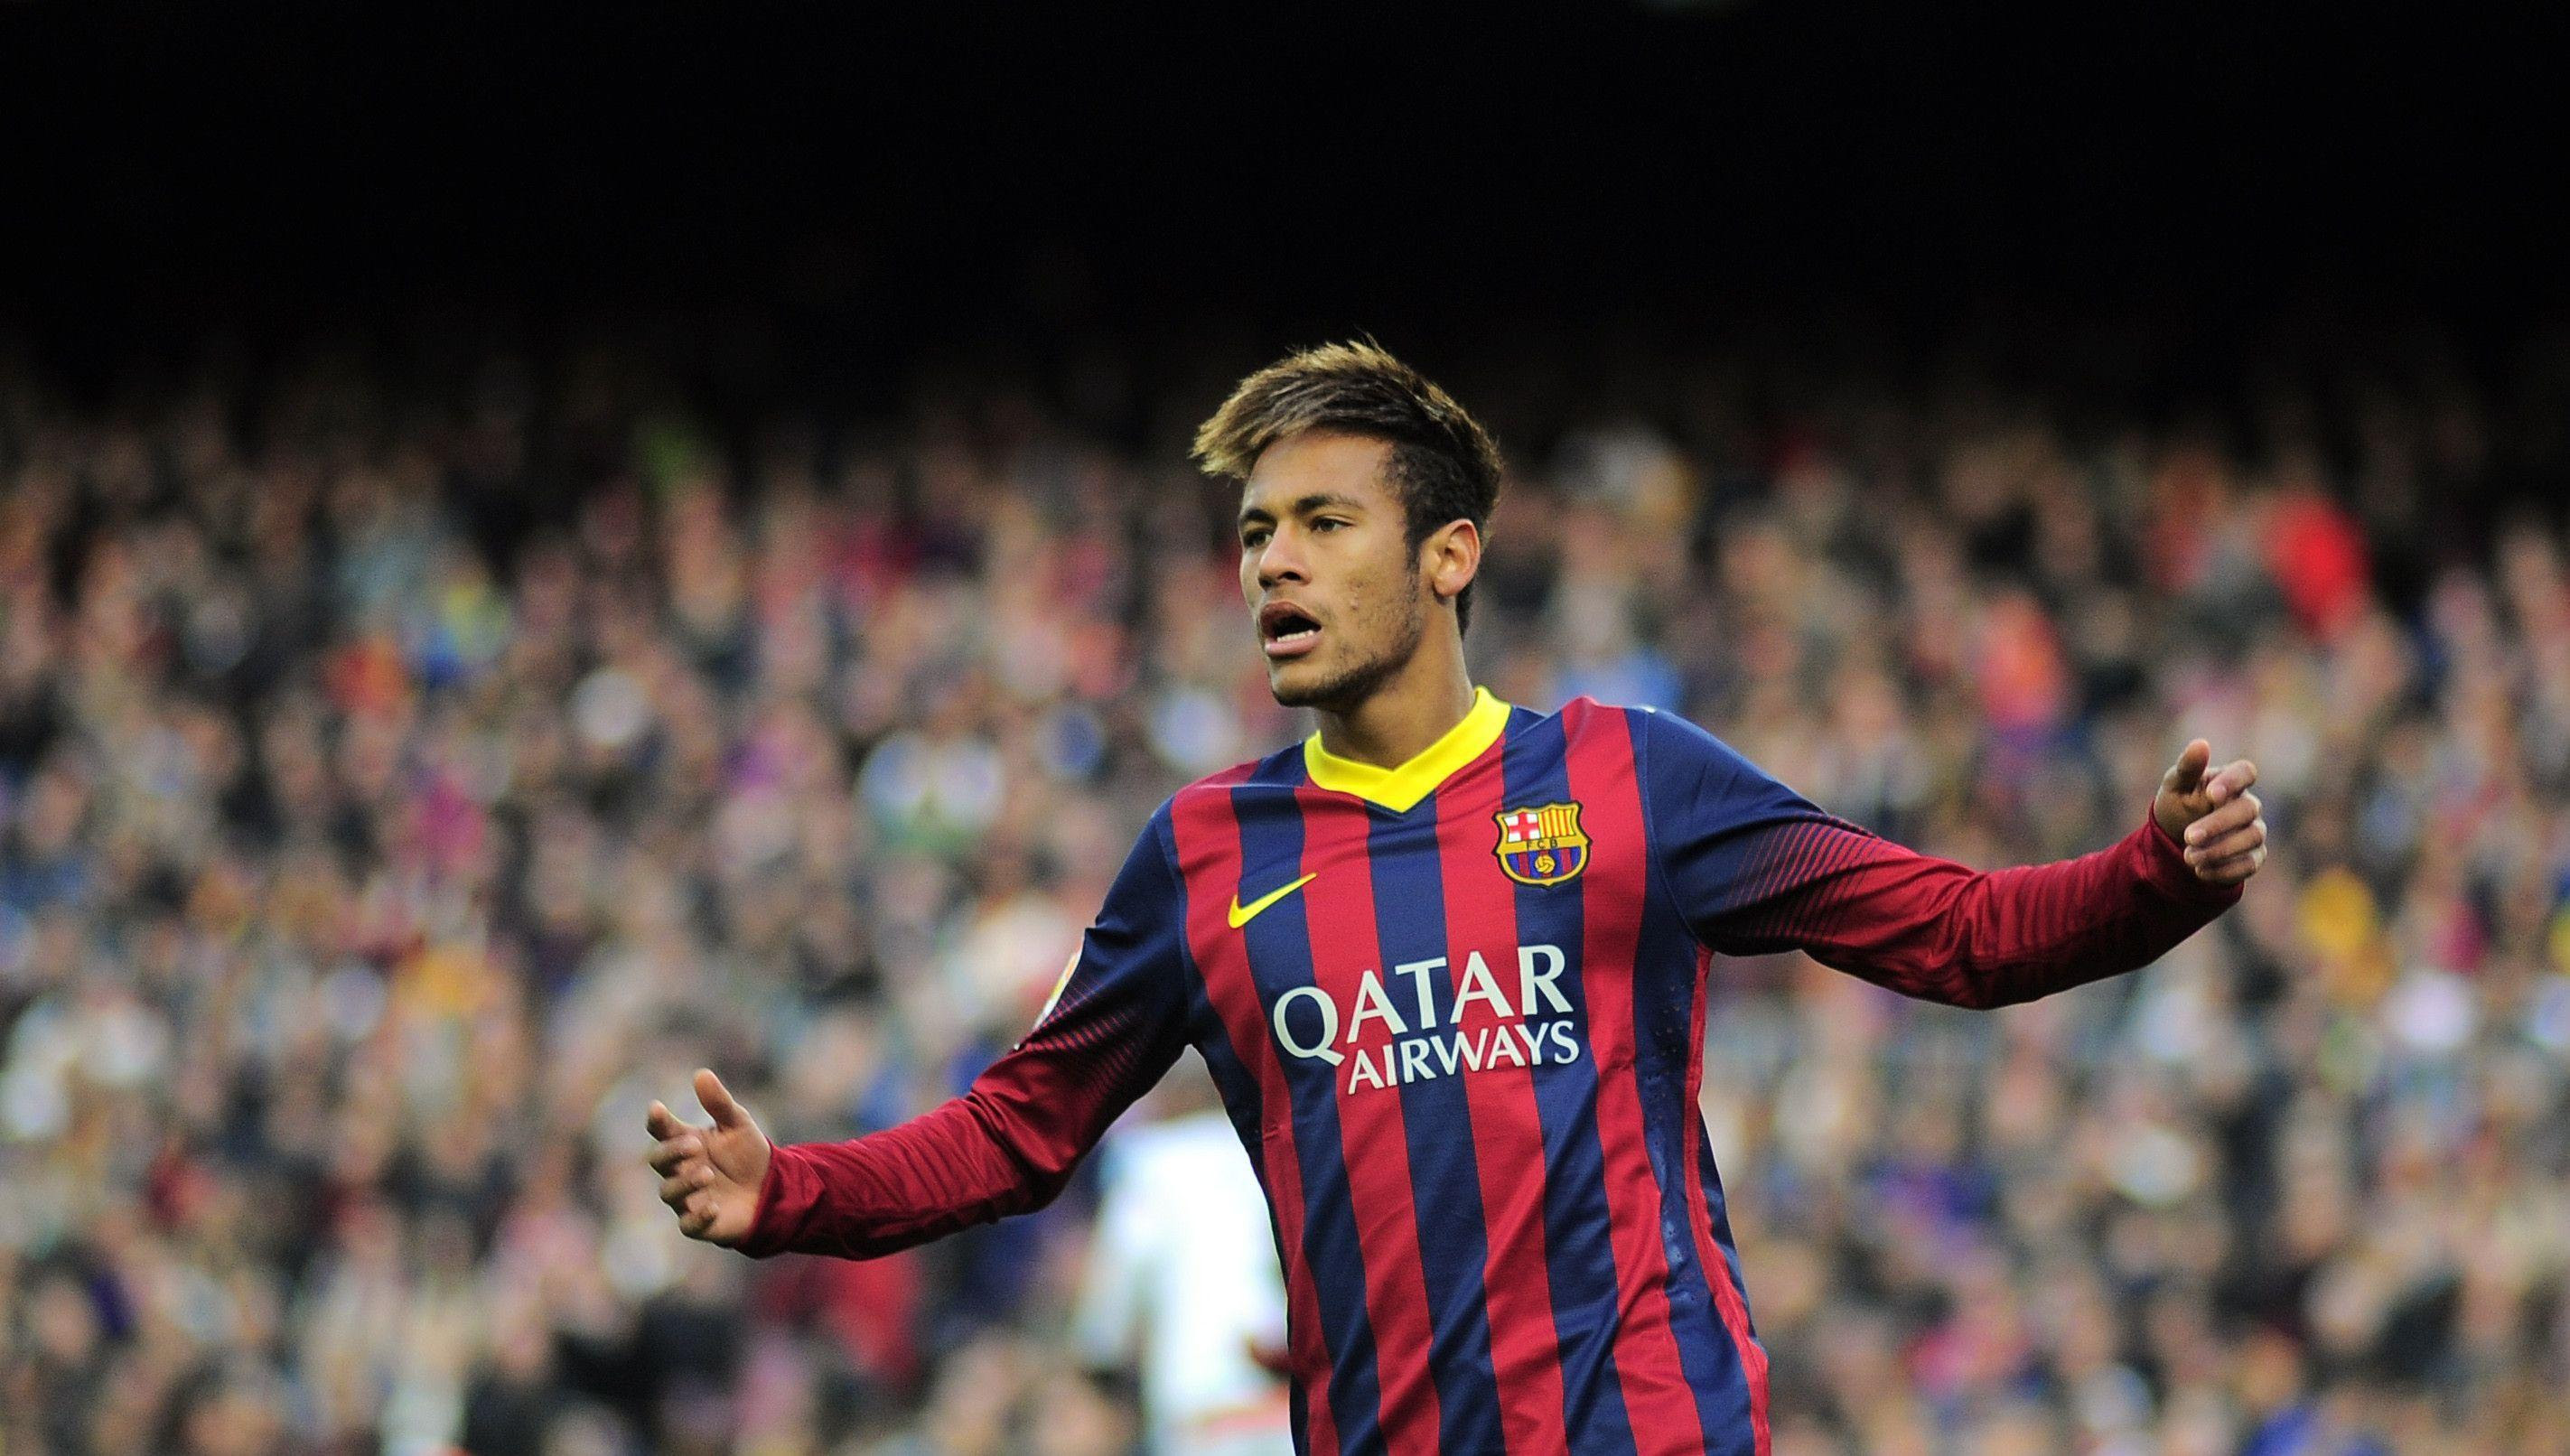 Neymar Jr Wallpapers 2015 HD - Wallpaper Cave